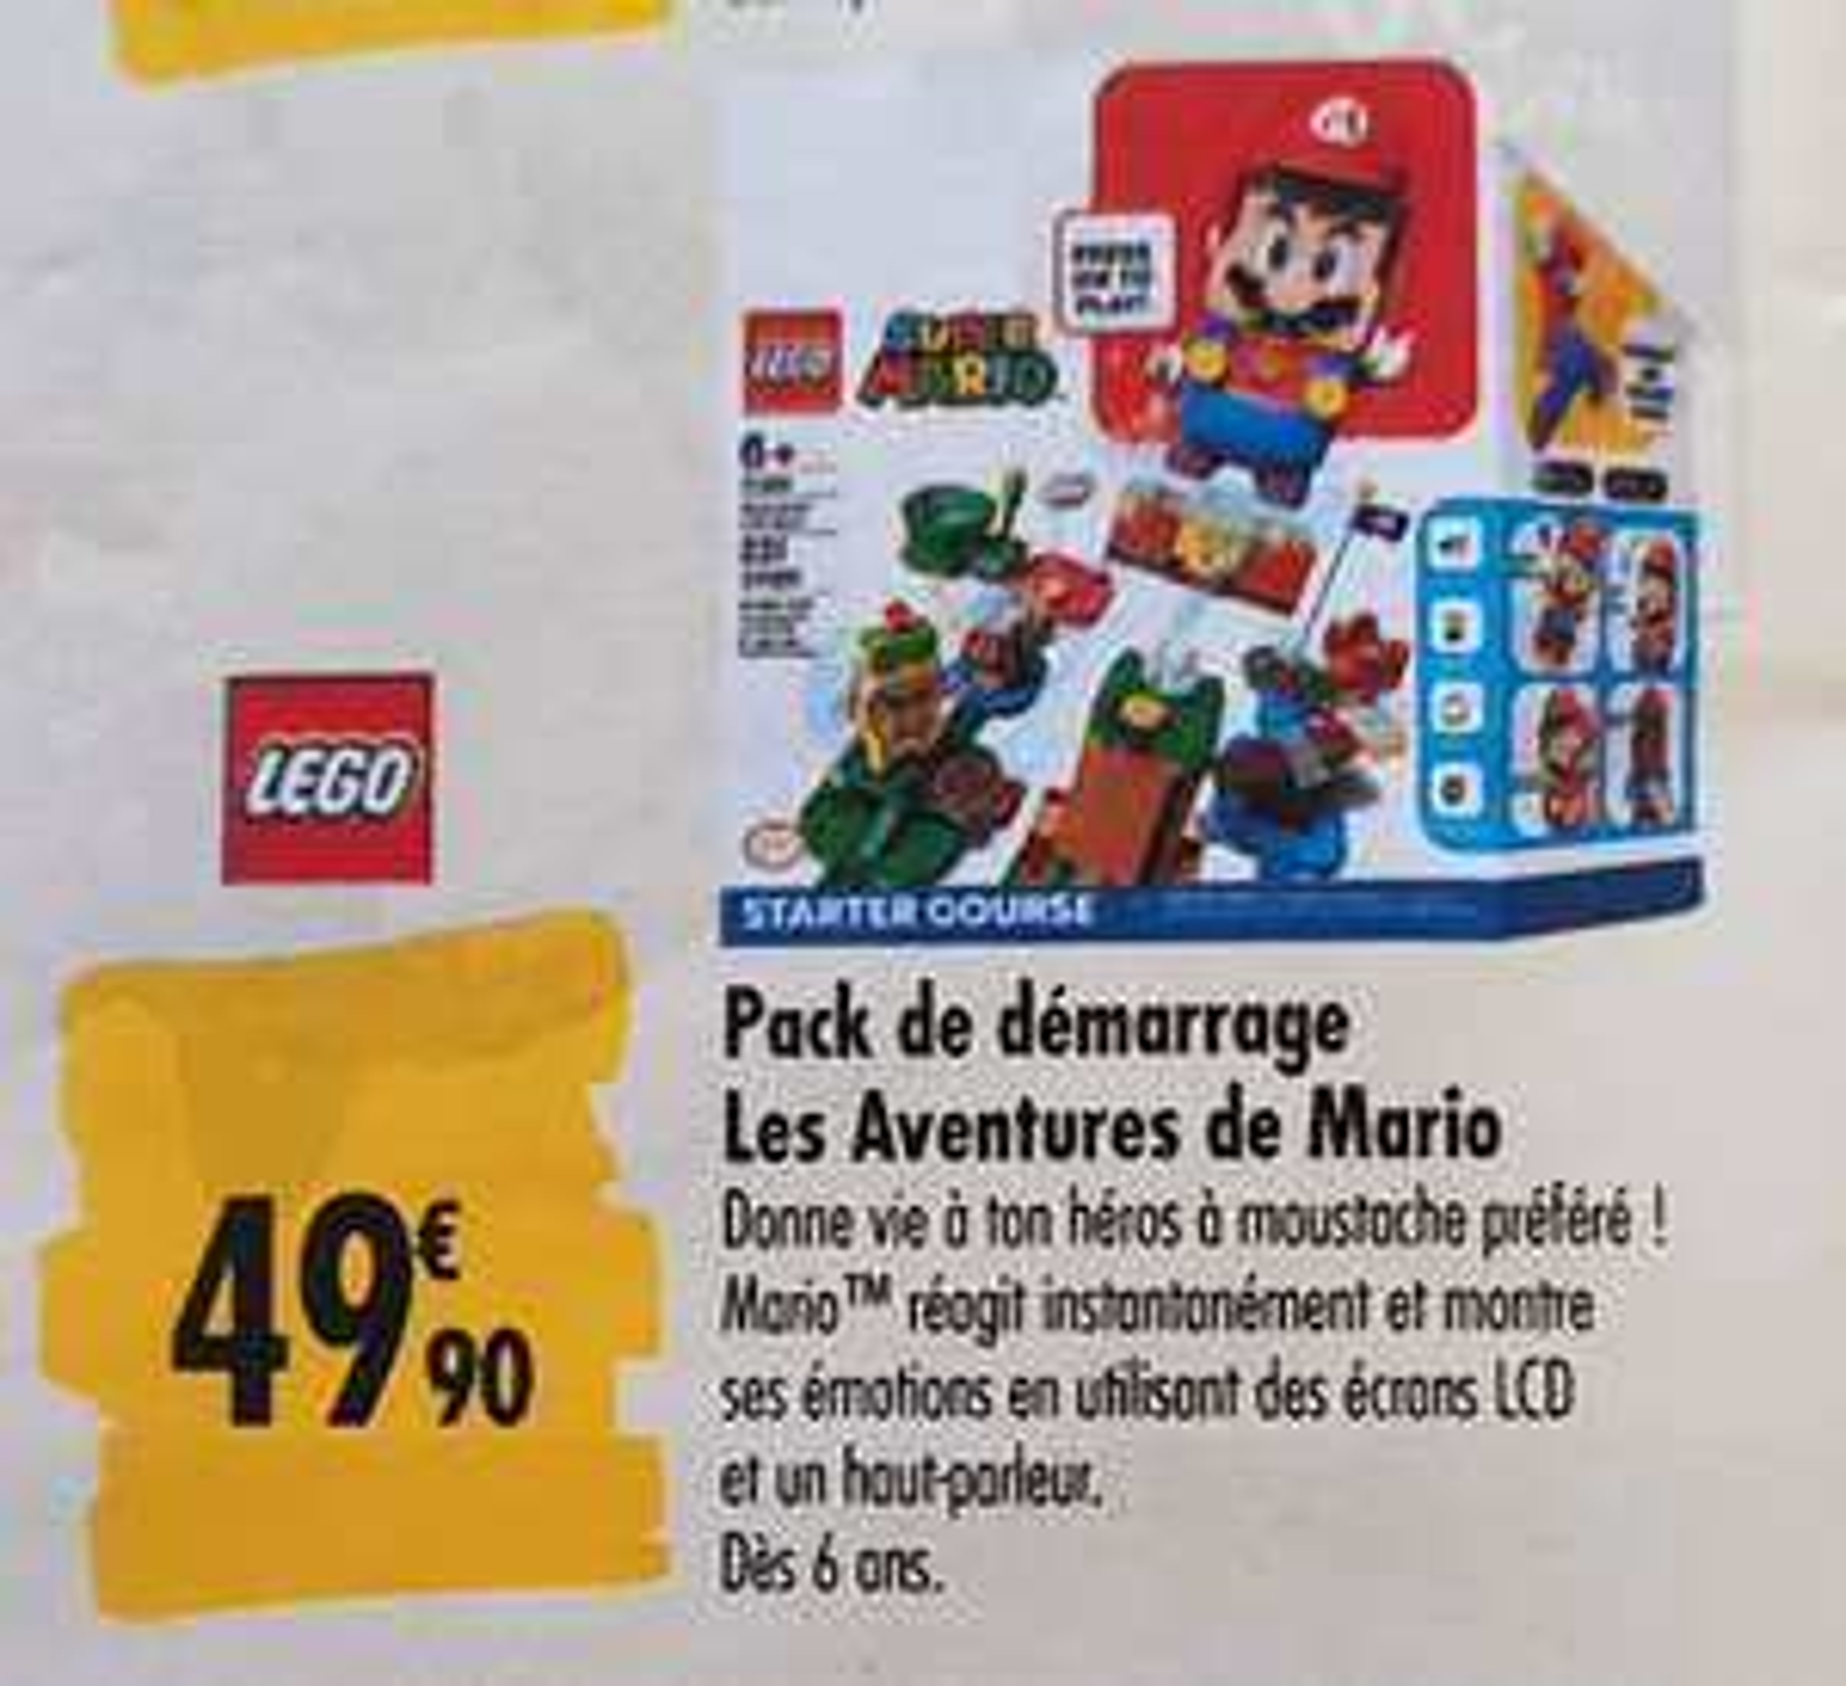 Pack de démarrage Lego Super Mario - Les Aventures de Mario (71360)